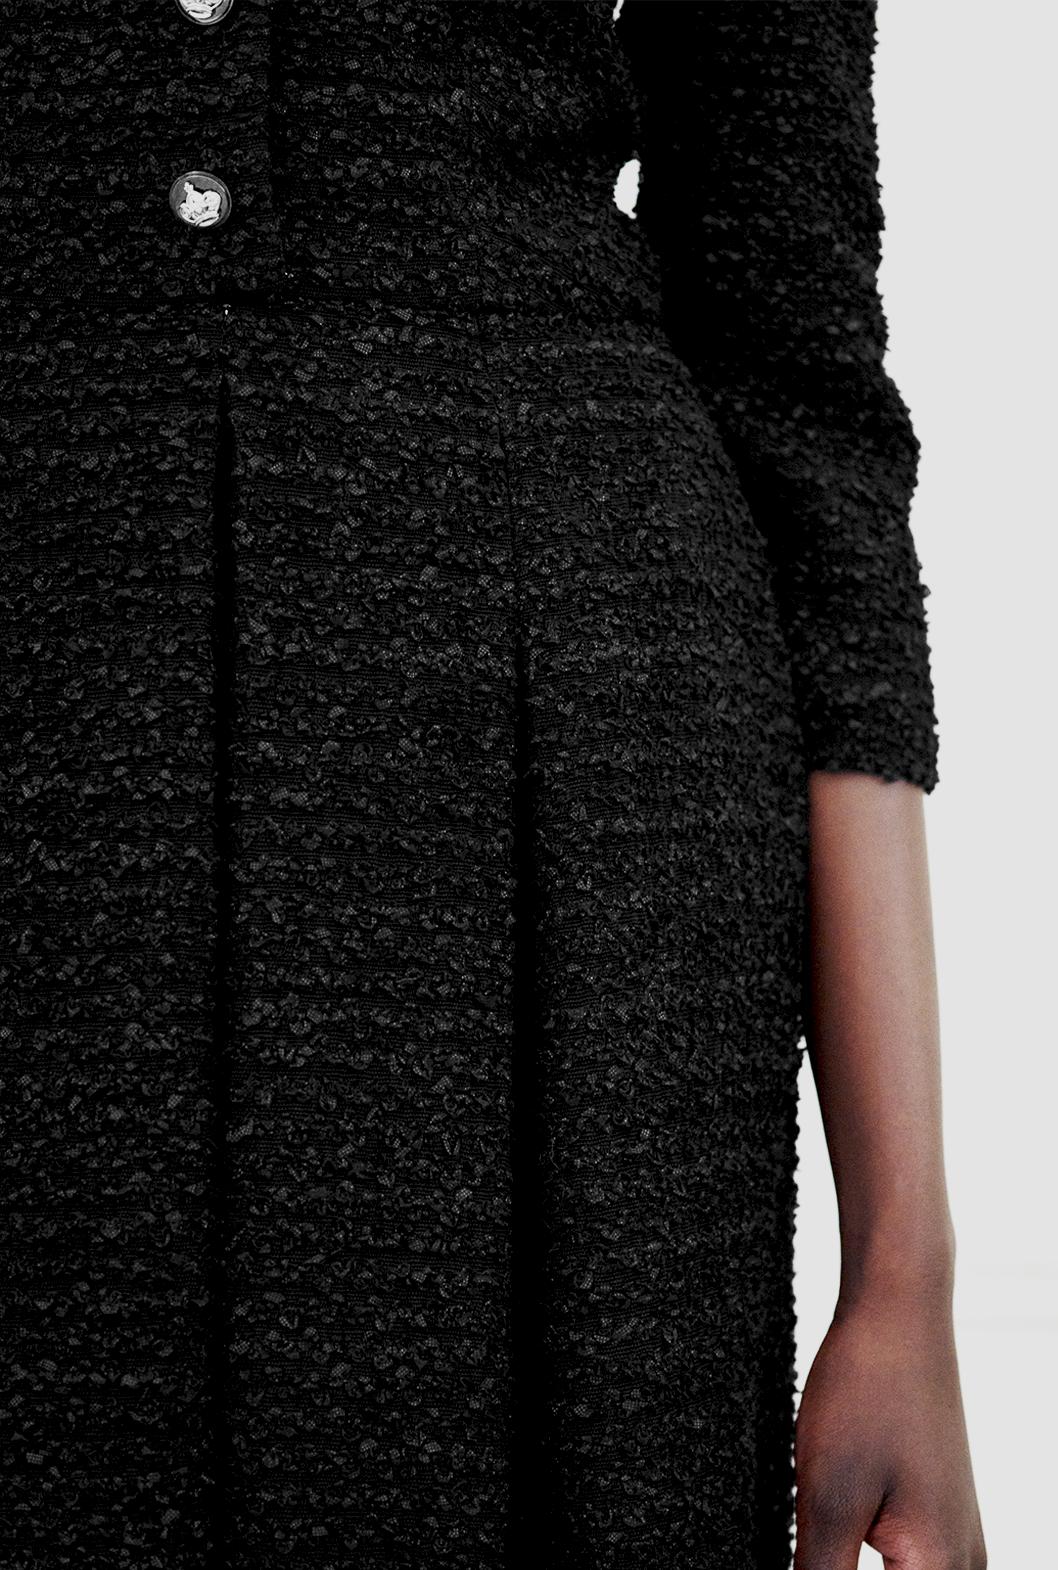 9 M Black Dress Detail.png